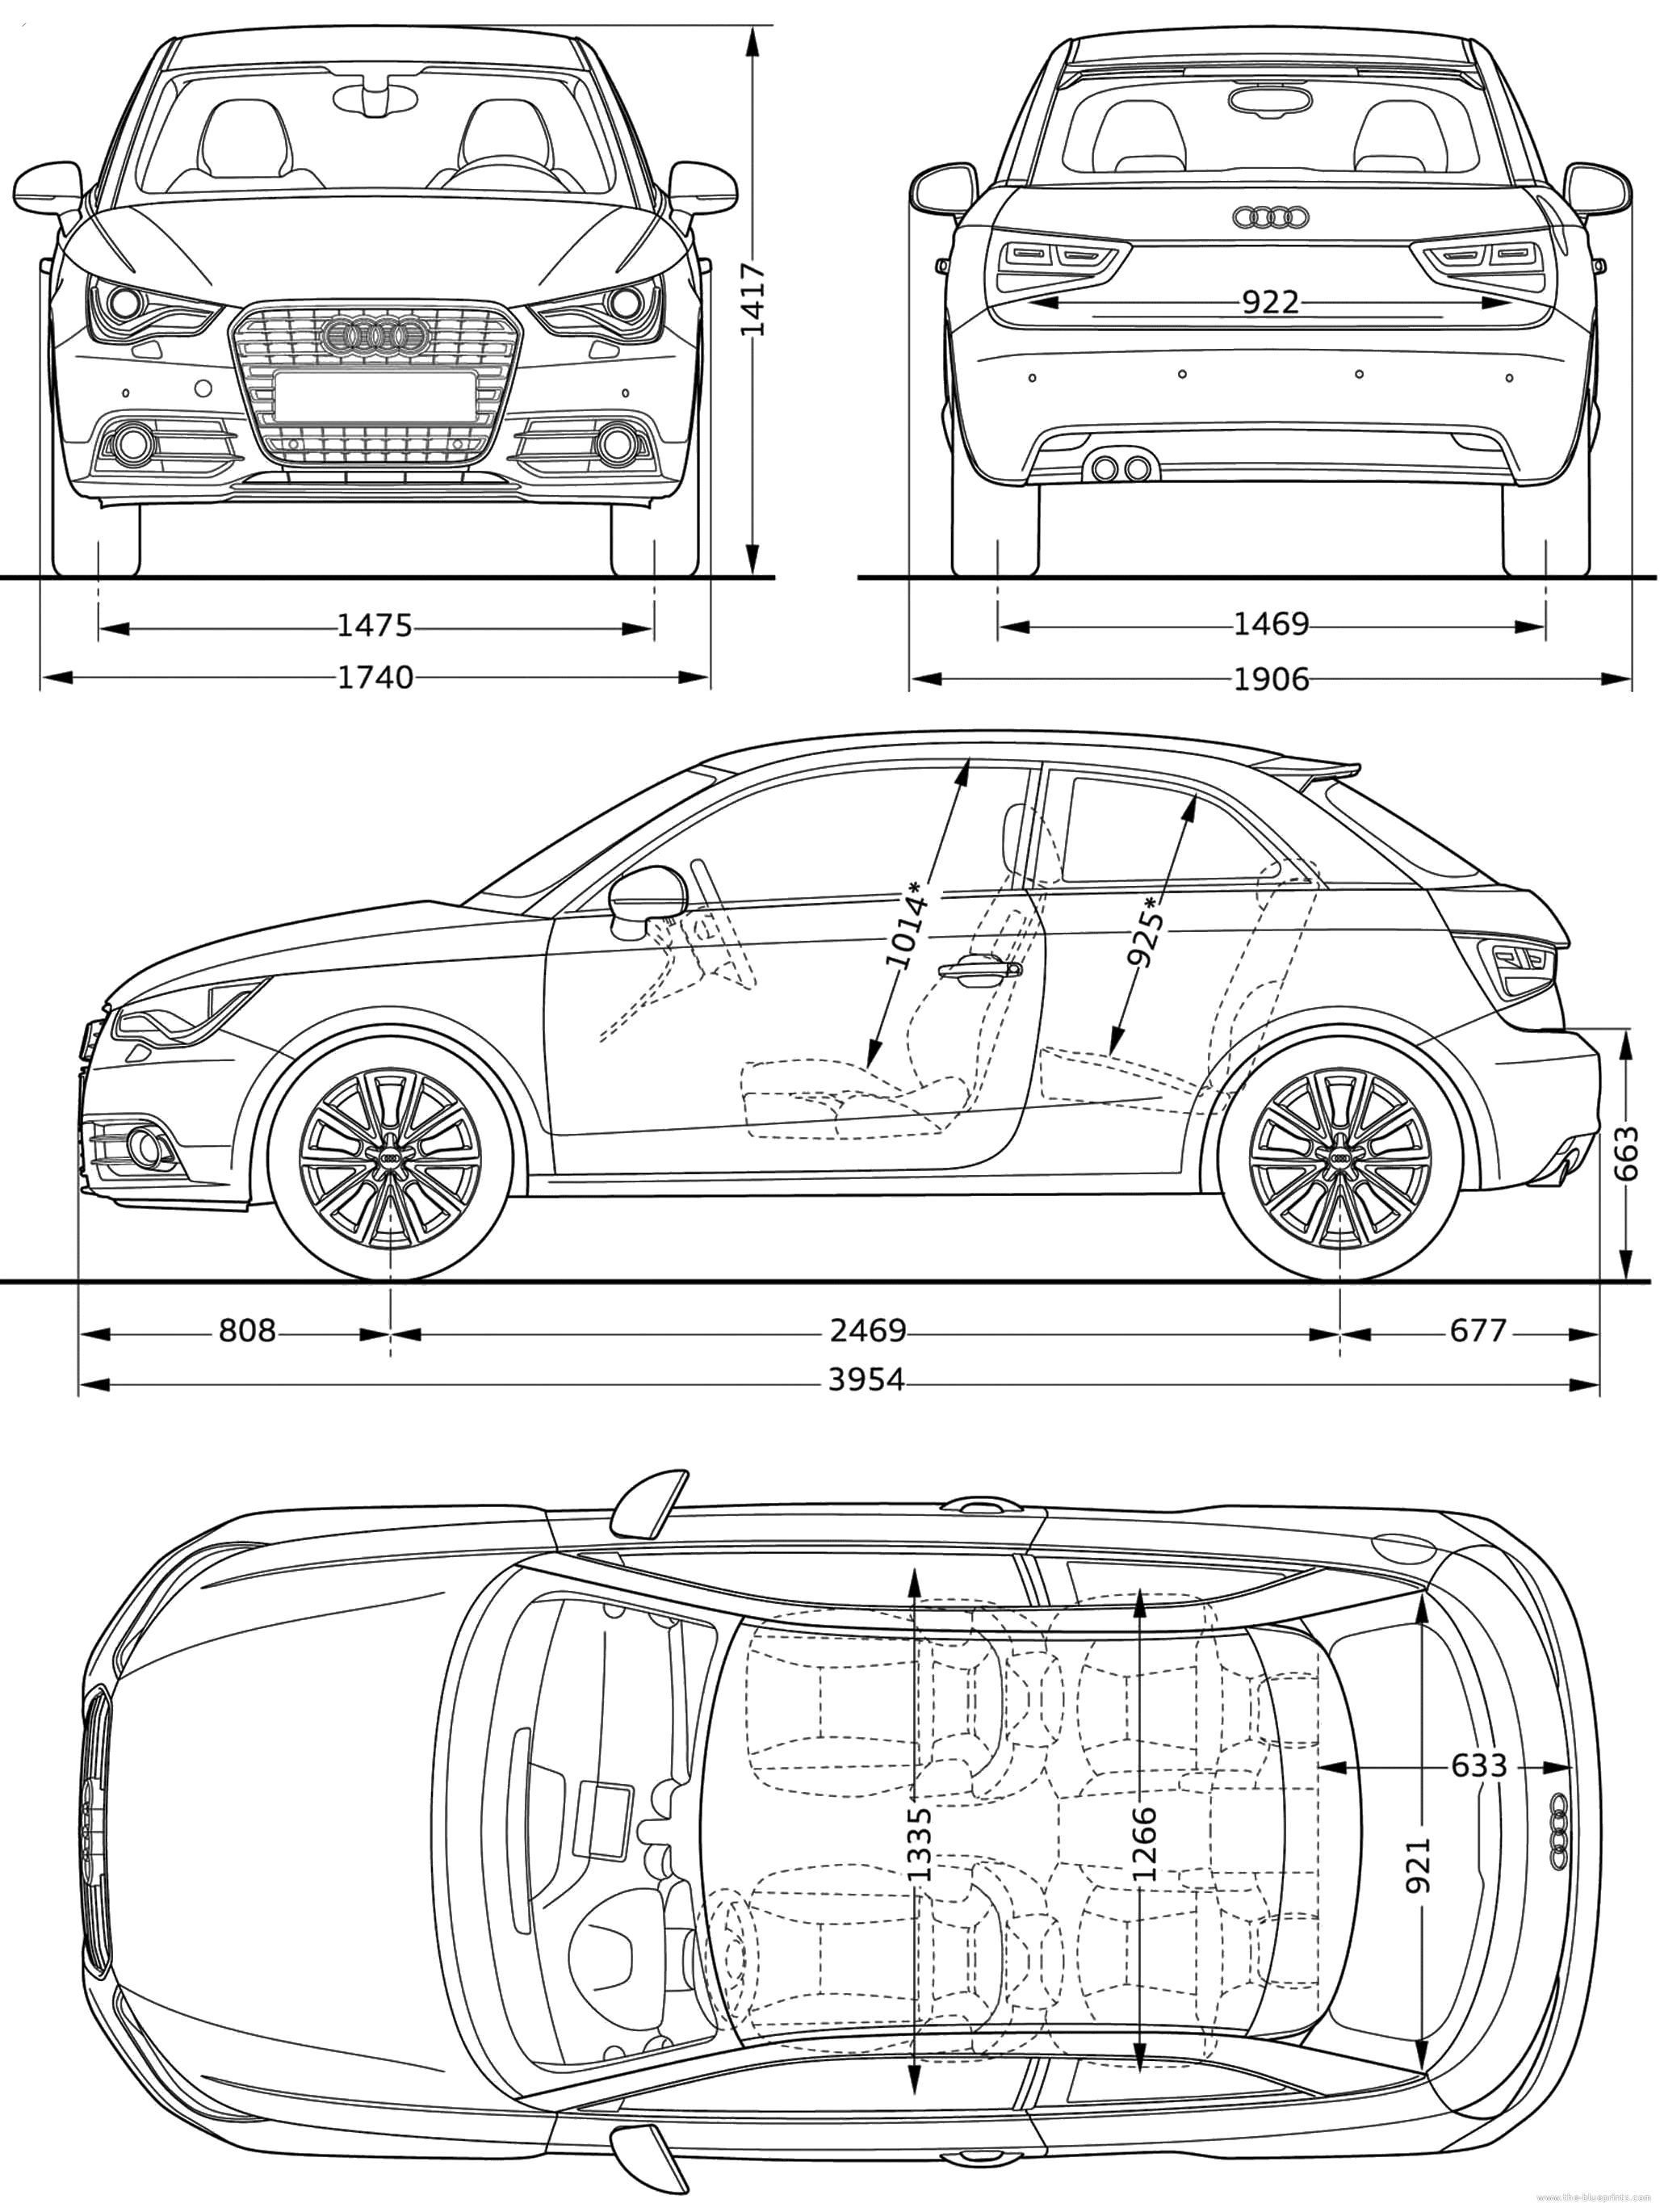 The Blueprintscom Blueprints > Cars Audi A1 2010 | Blue print cars ...